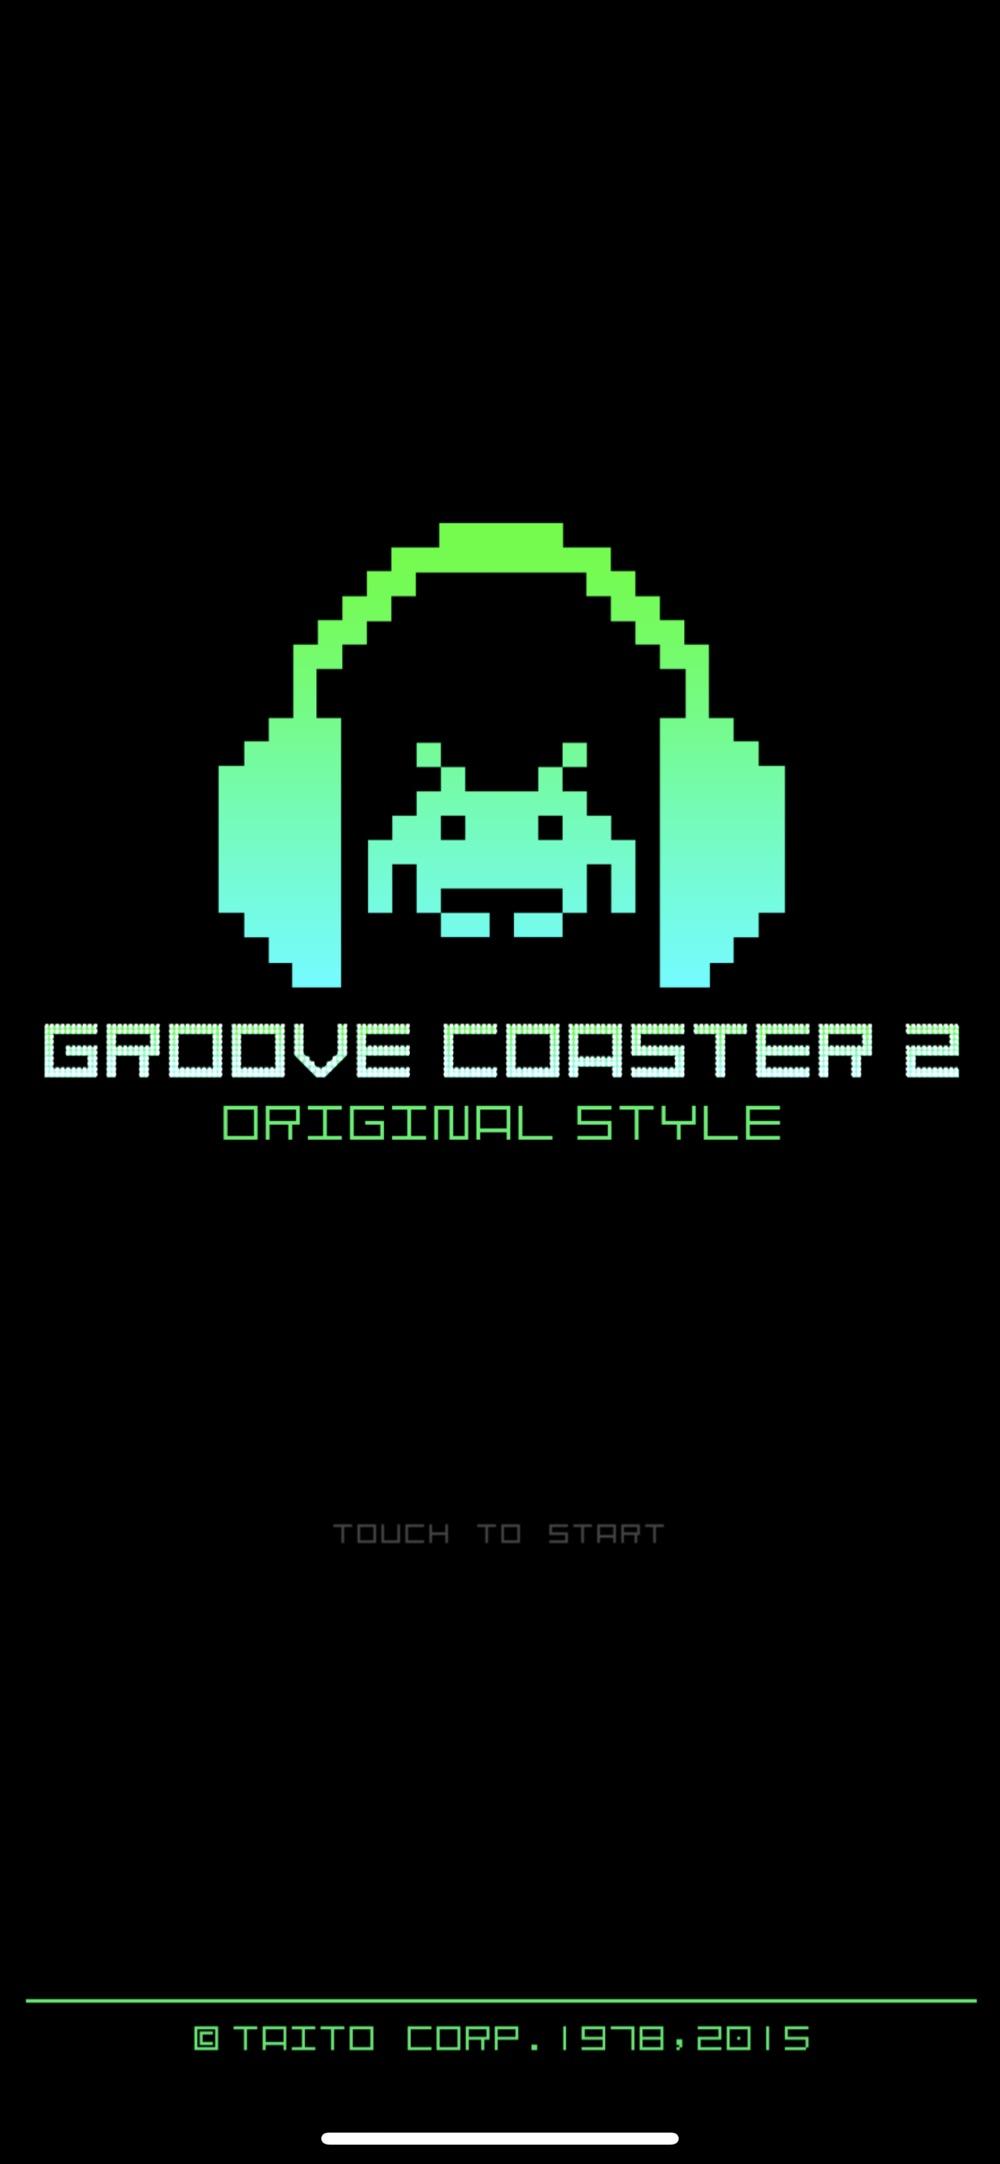 Groove Coaster2 Original Style Cheat Codes